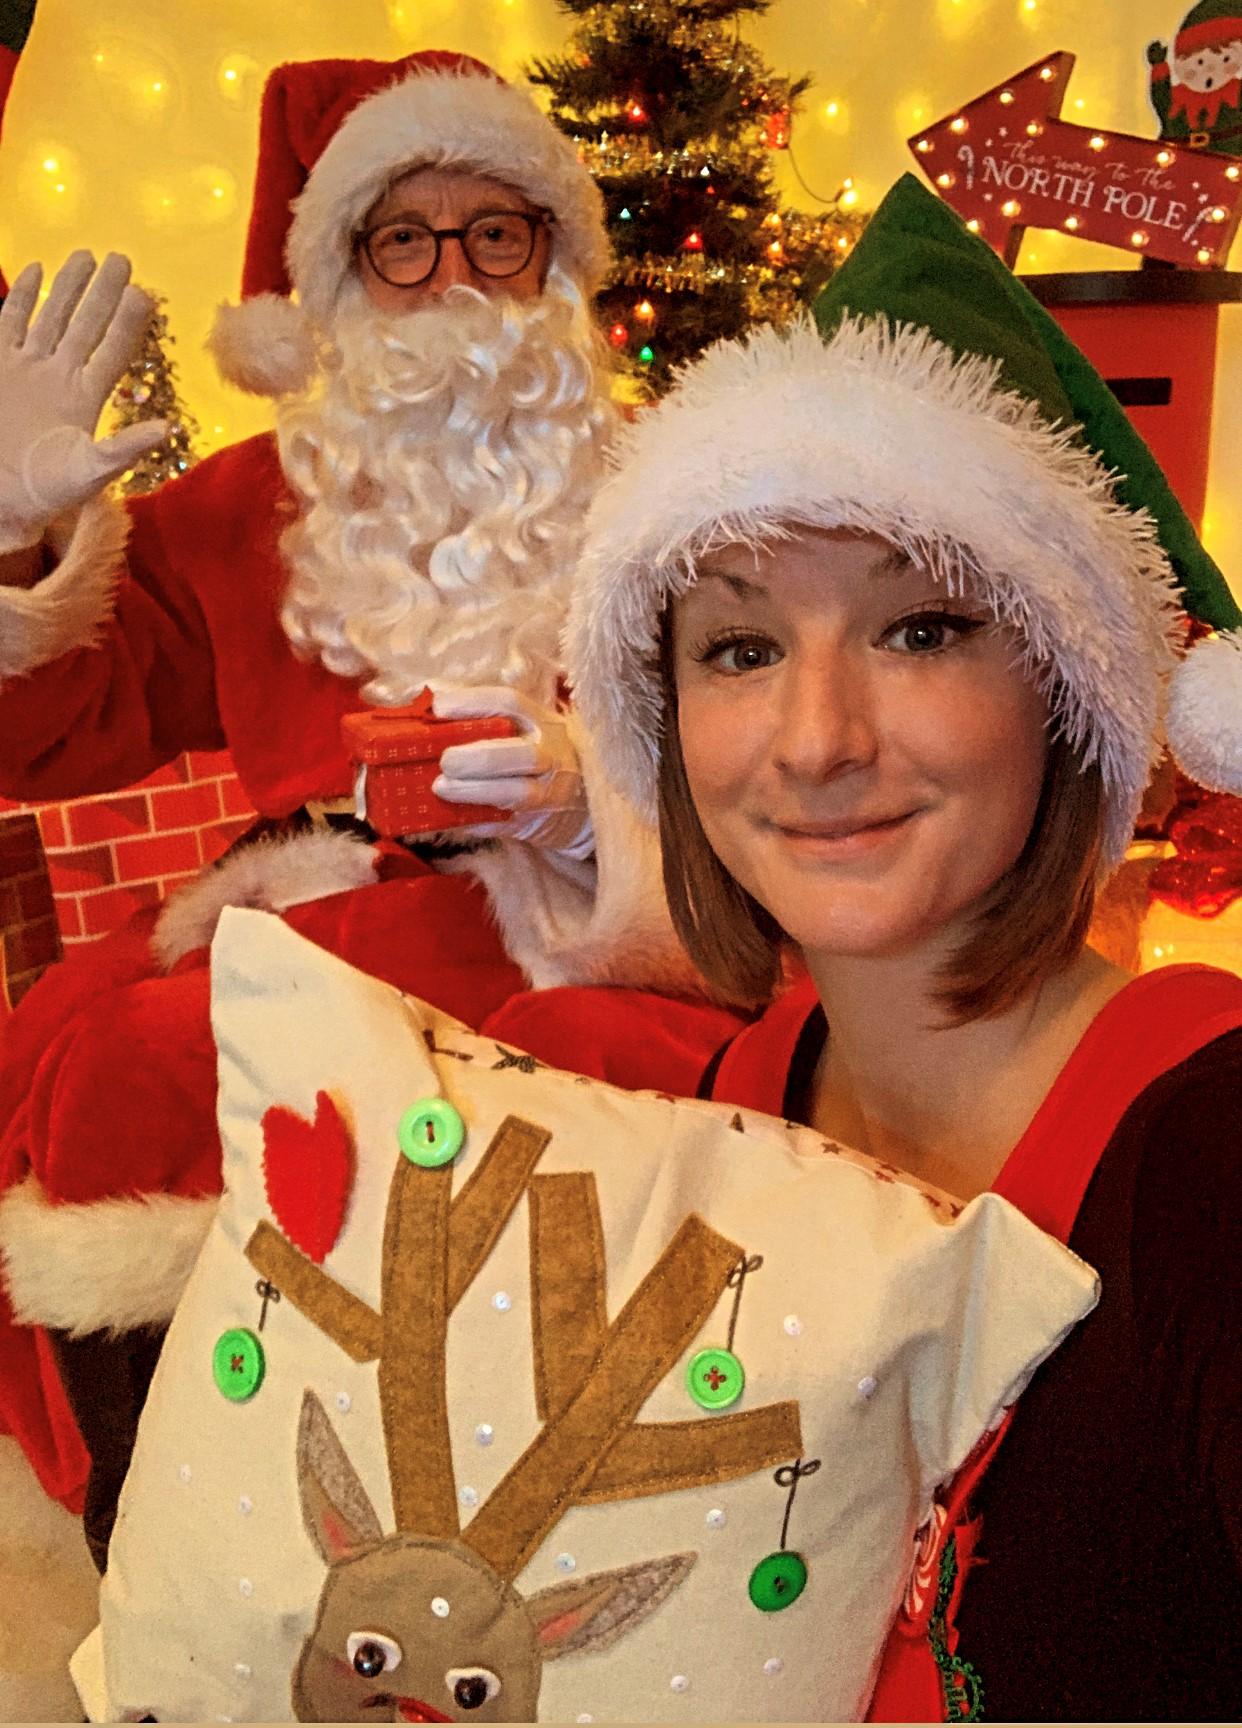 Leicestershire estate agents raises £1,255 for children's hospice